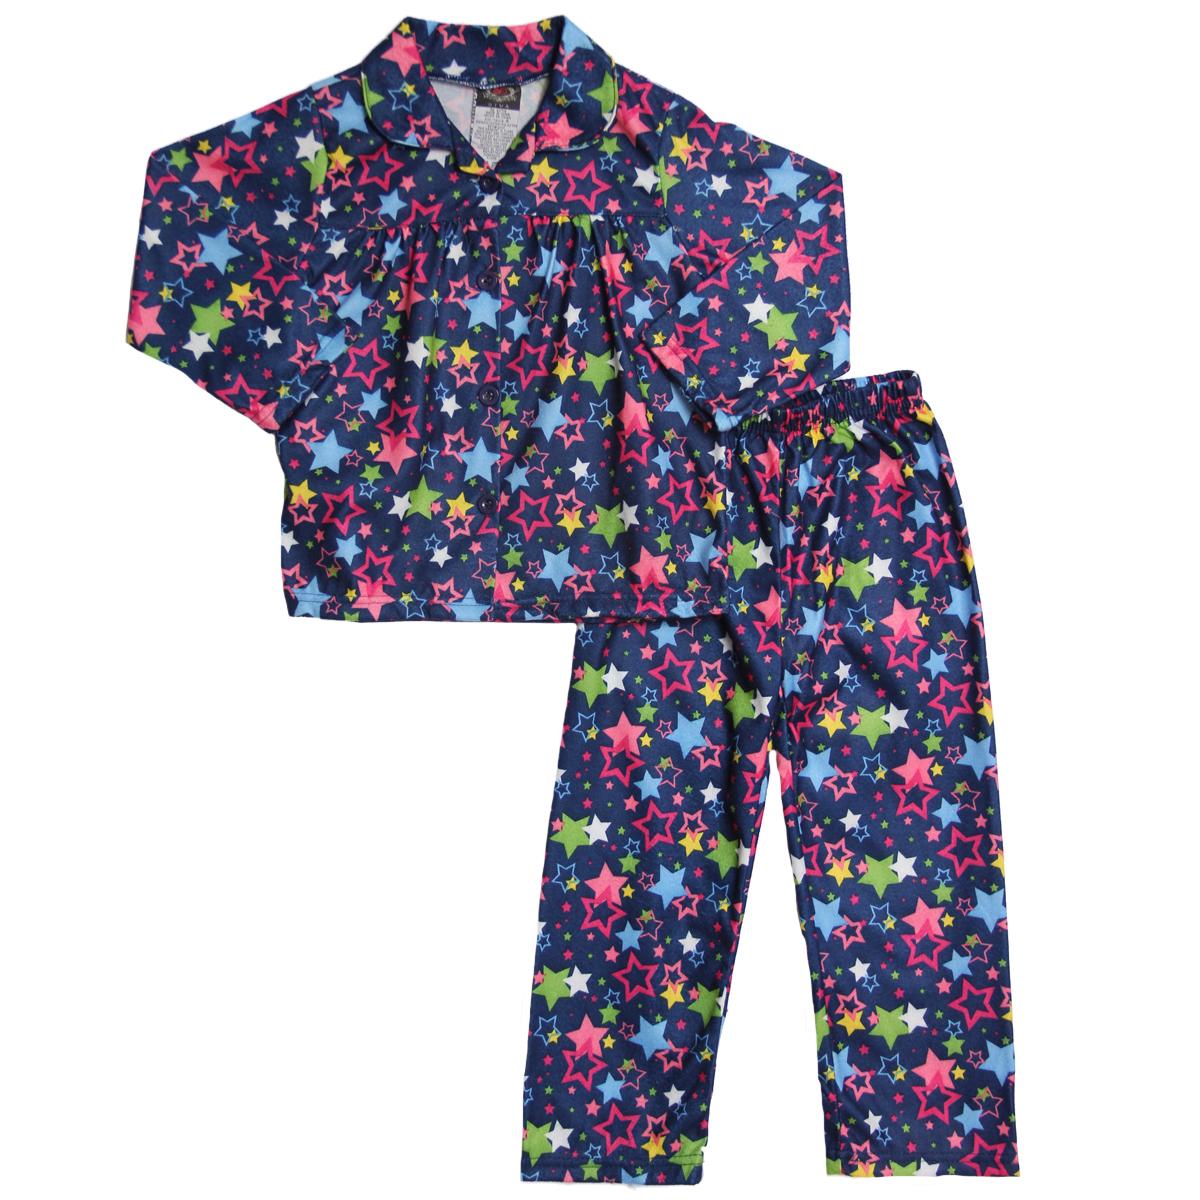 Emanuel Ungaro Little Girls 2 Piece Navy Pink Star Flannel Pajama Shirt Pants Pjs Set at Sears.com